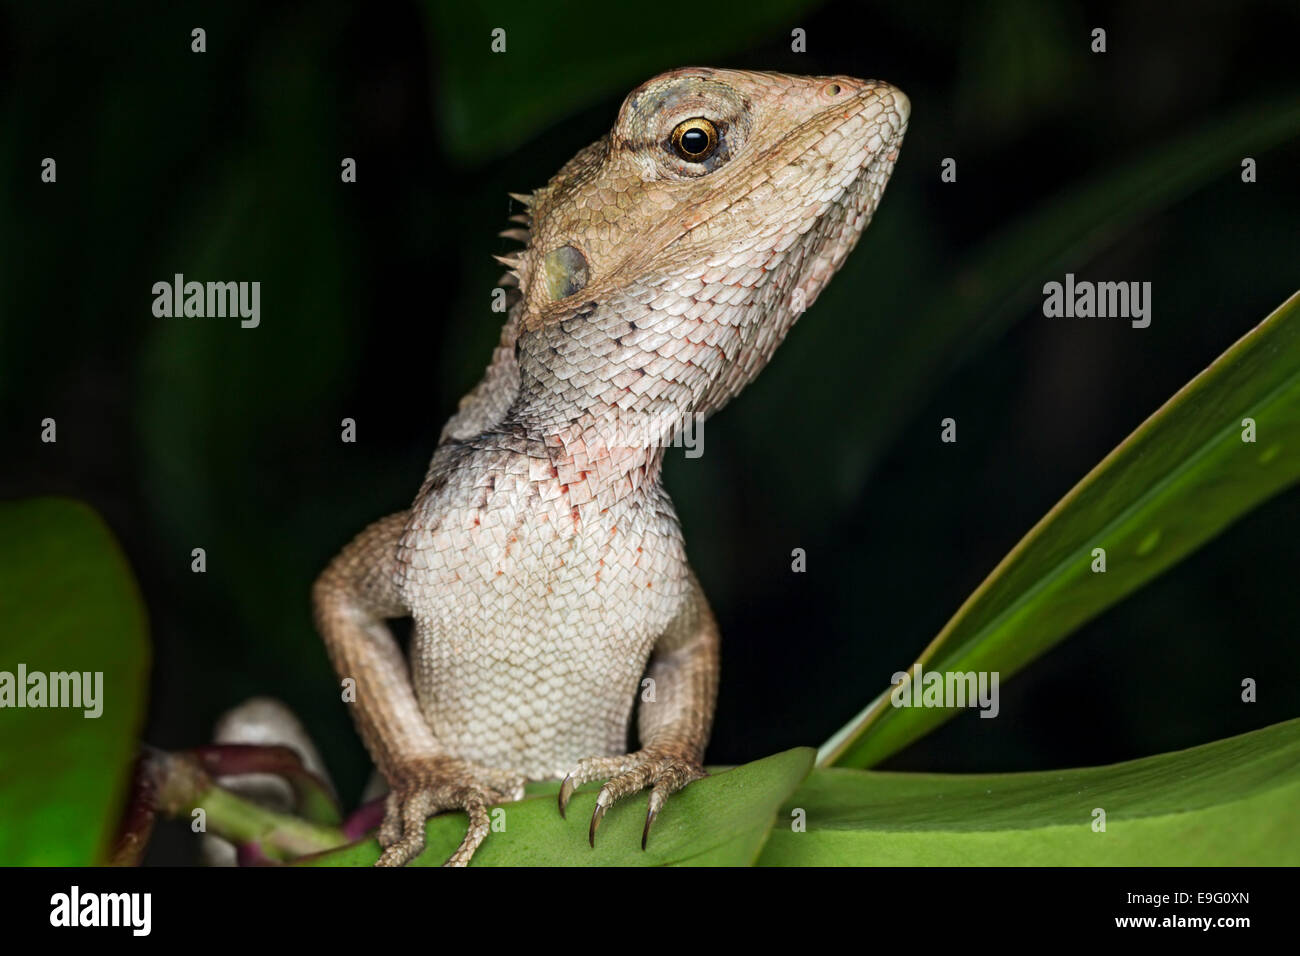 Veränderbare Eidechse (Calotes versicolor) Stockbild